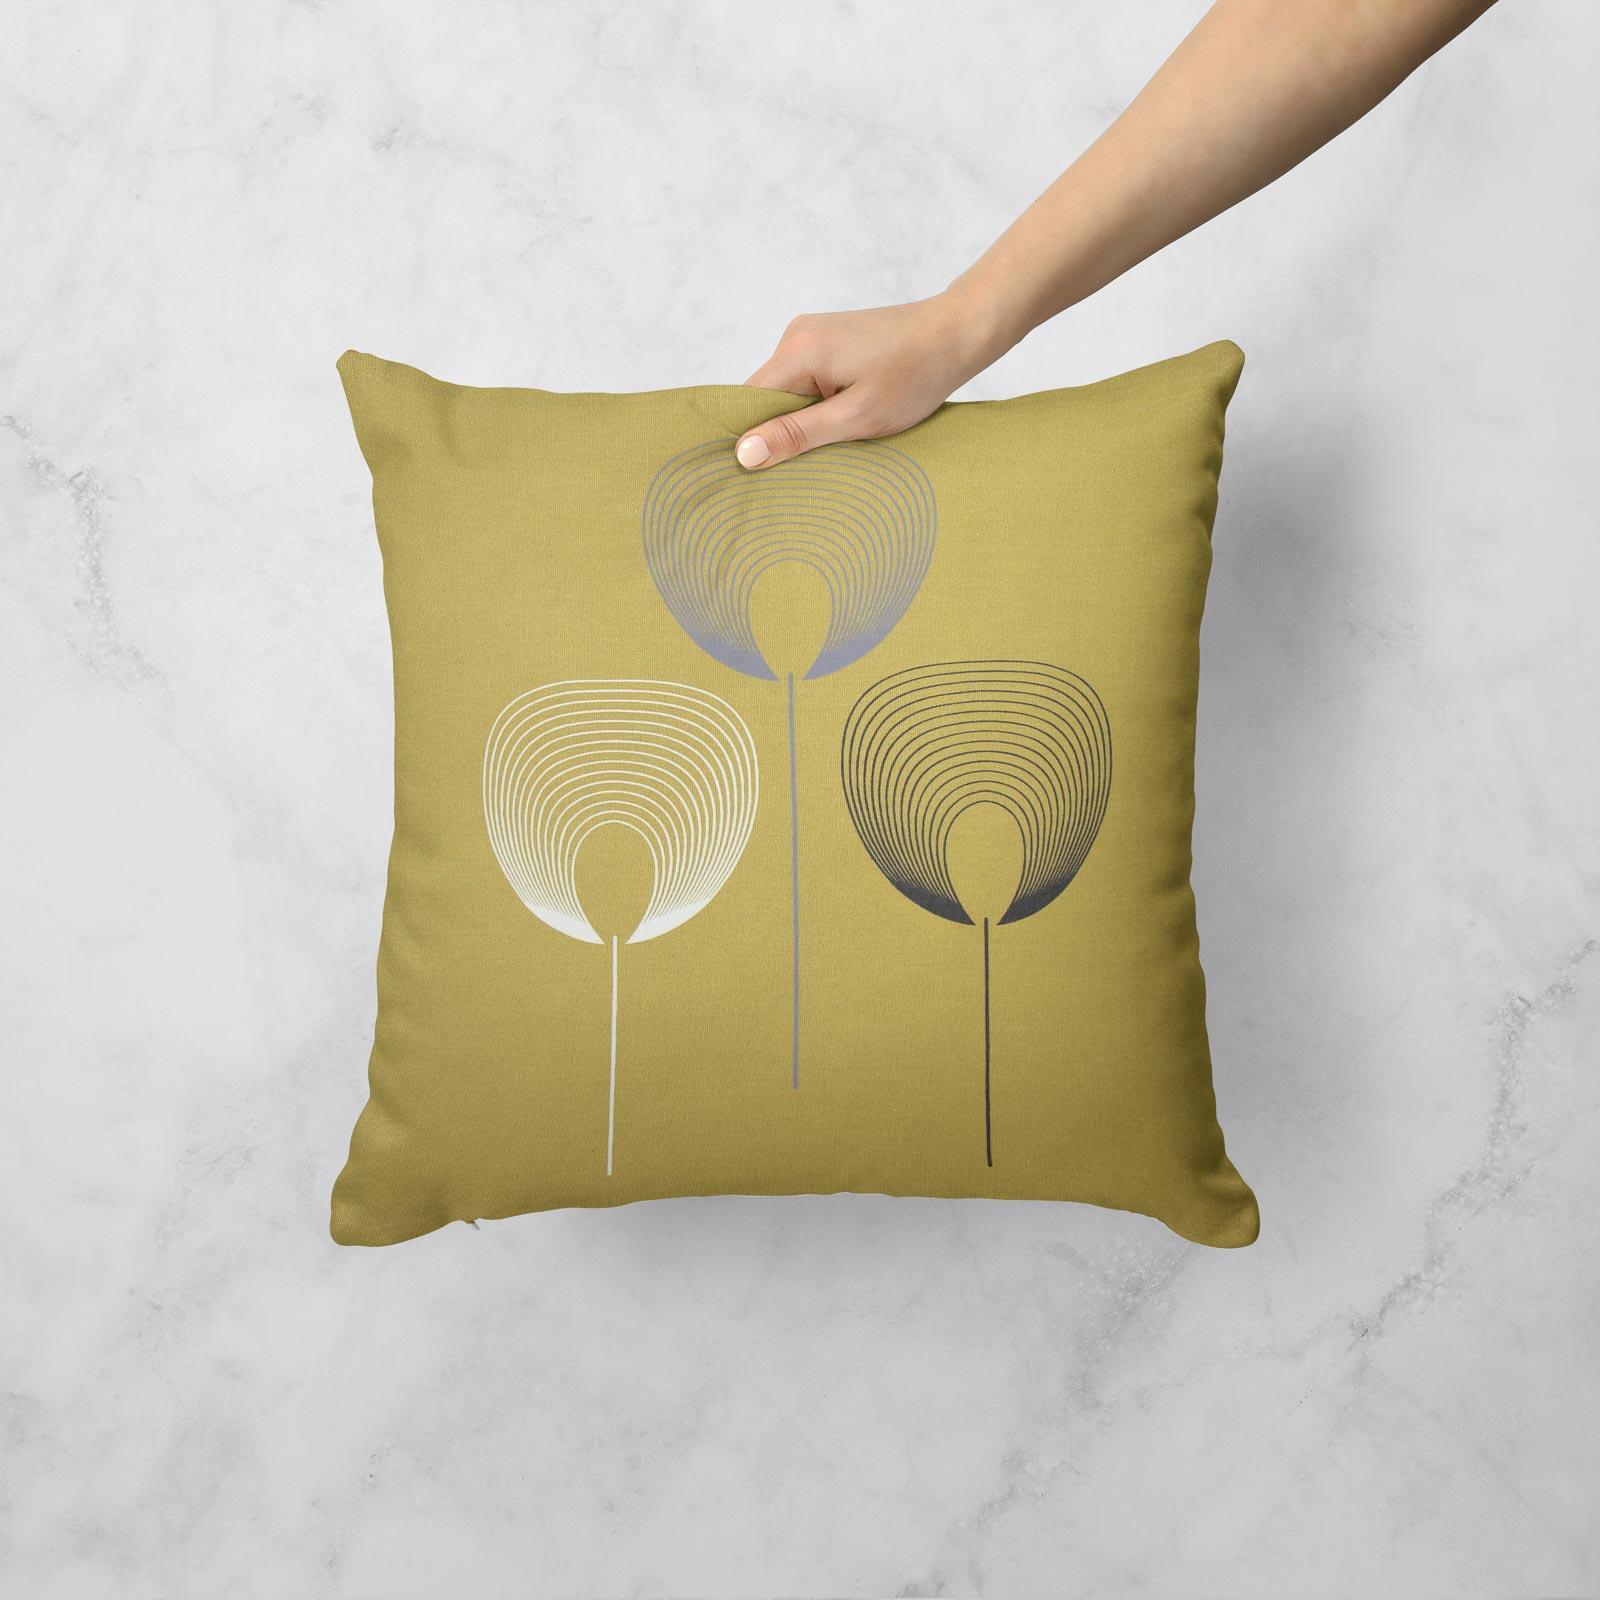 Geometrica-Cushion-Covers-Cojines-De-Impresion-Floral-Gris-Beige-Ocre-cubre-17-034-X-17-034 miniatura 6